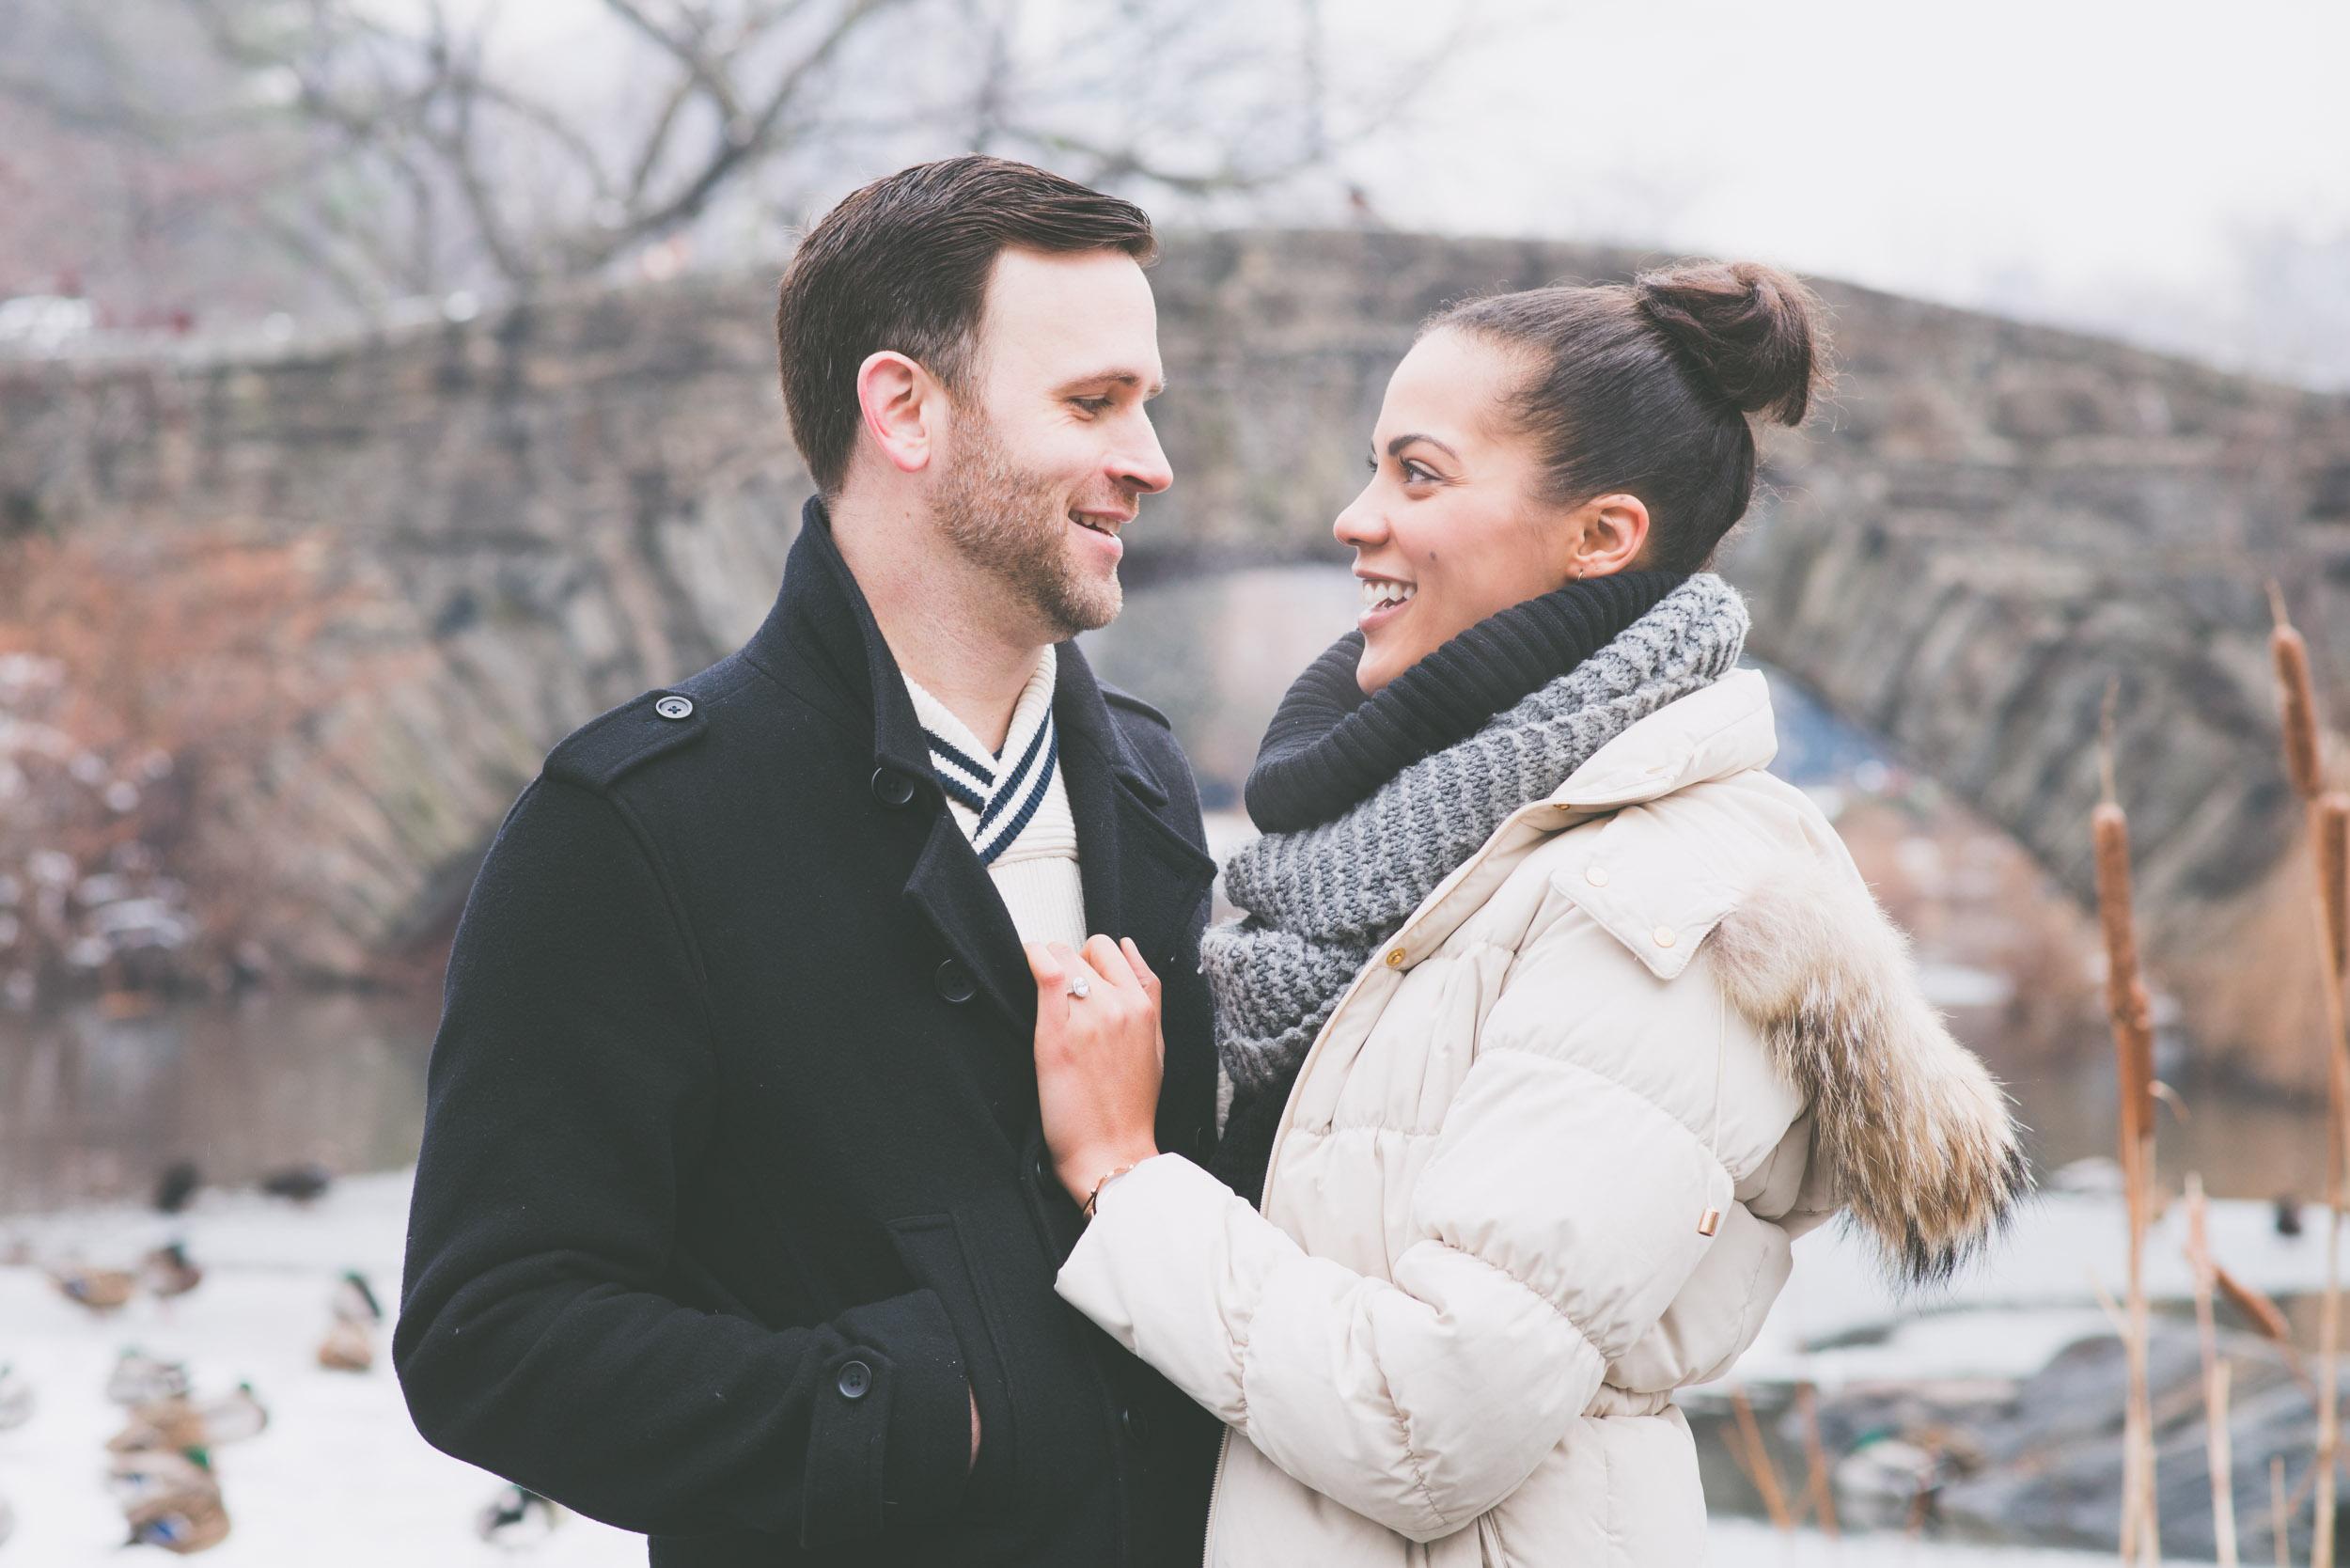 Couple at Gapstow bridge 2 - Engagement portraits -  Photo credit Nicola Bailey.jpg